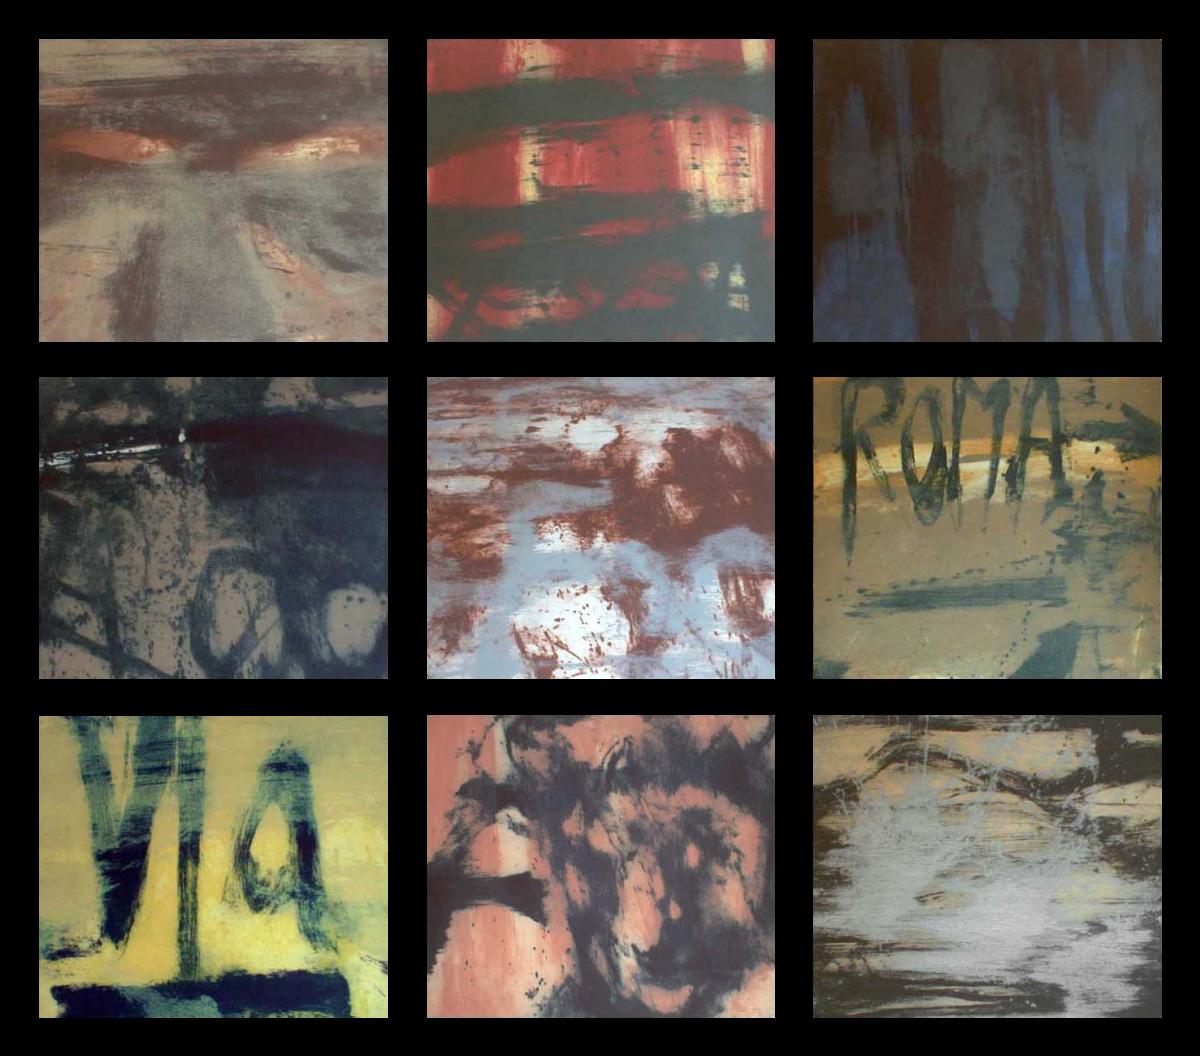 Hughie O'Donoghue Crossing The Rapido original set of 9 carborundum prints signed by the artist for sale